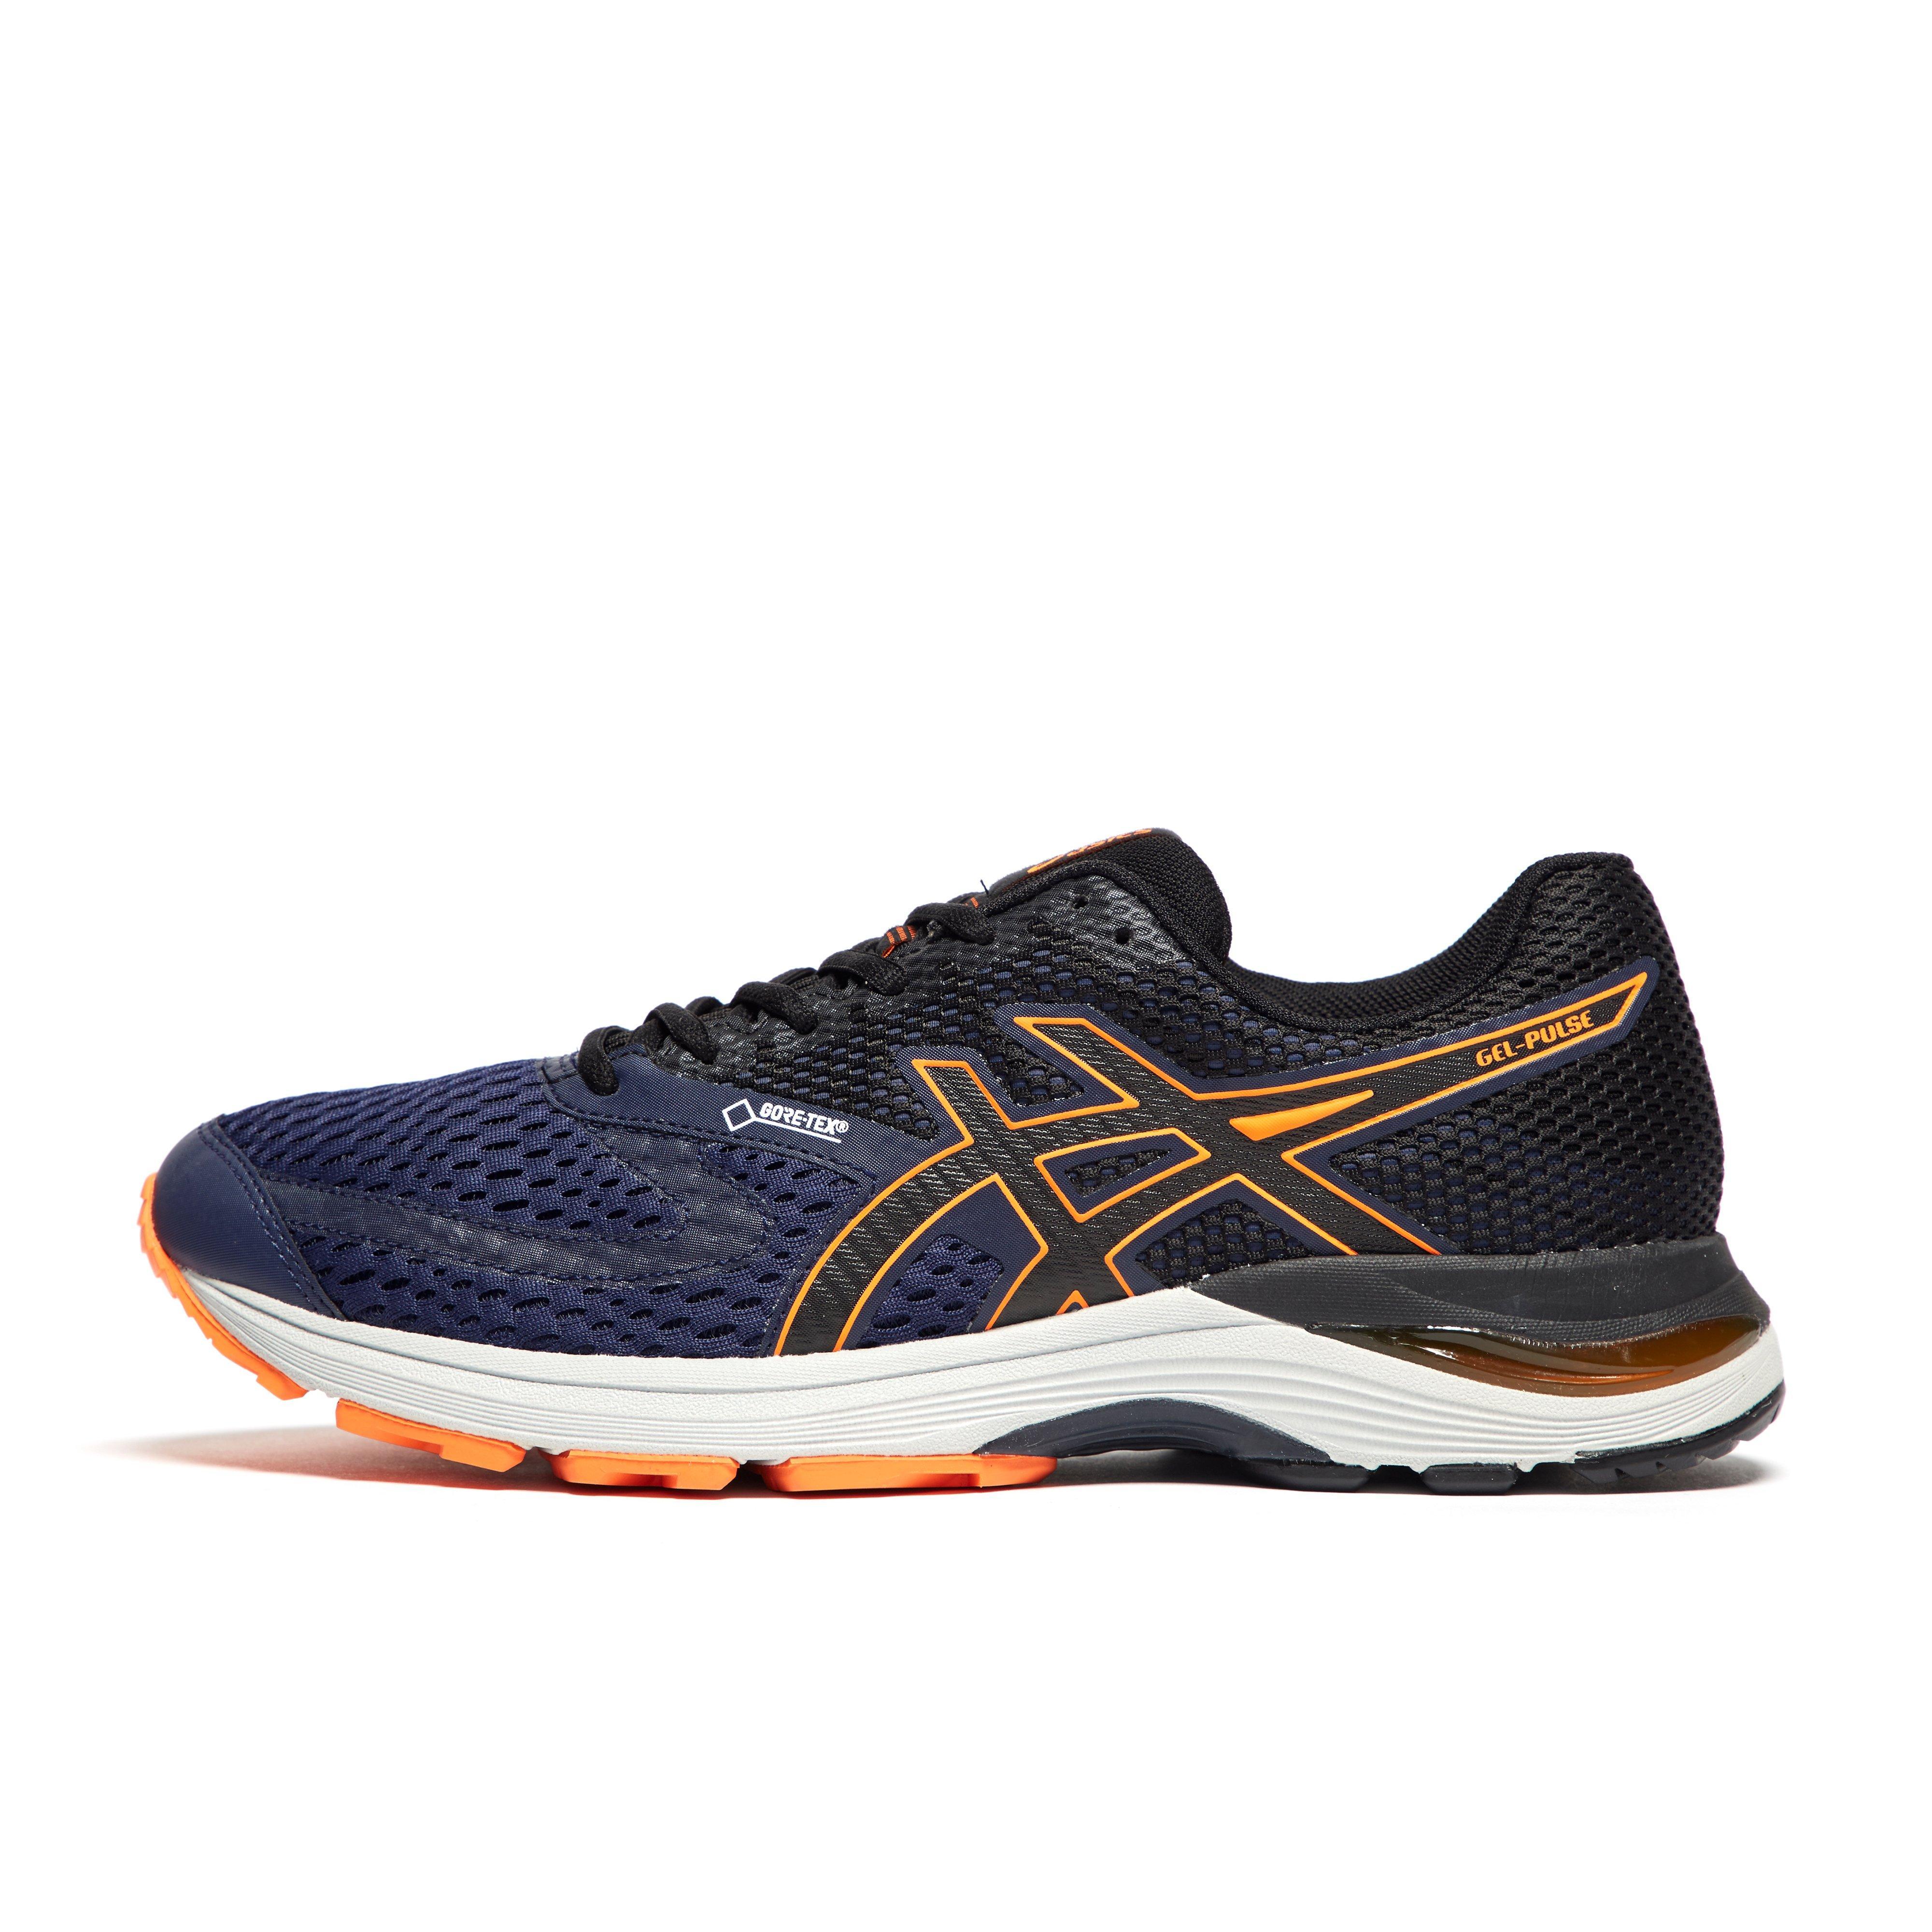 6d36965a0b14a Details about Asics Gel-Pulse 10 Men s Running Shoes